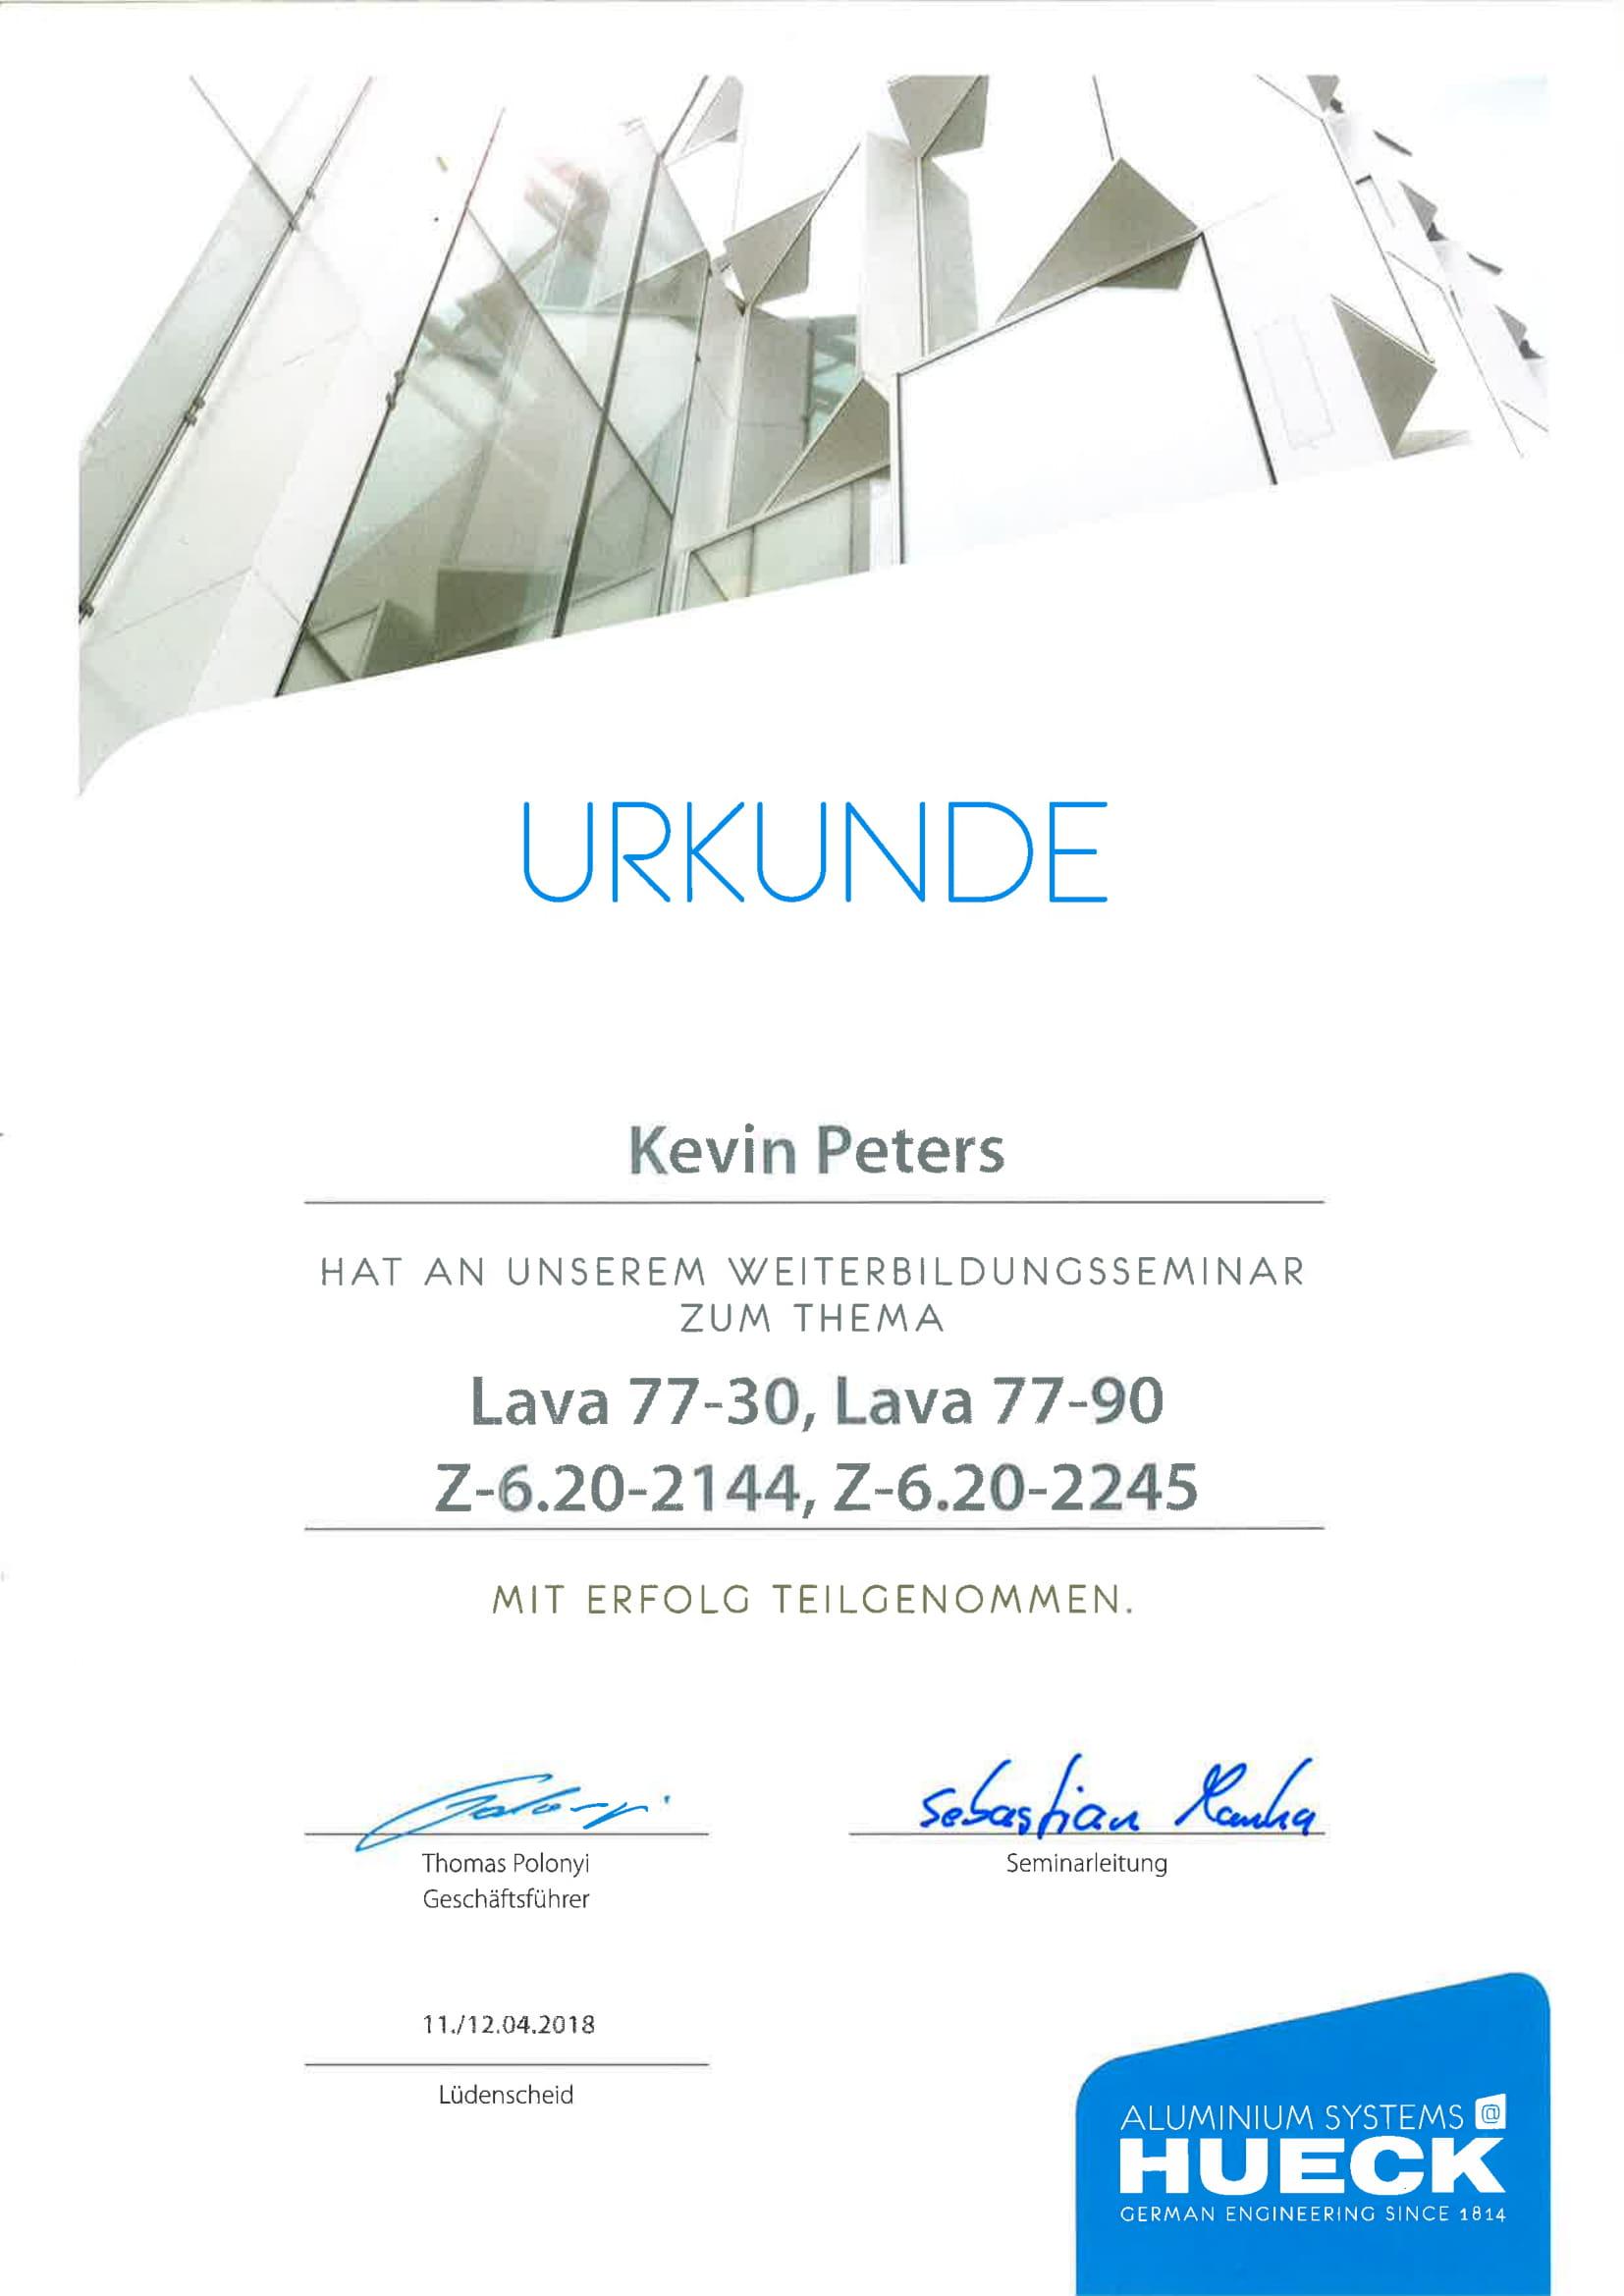 Urkunde Aluminium Systems HUECK